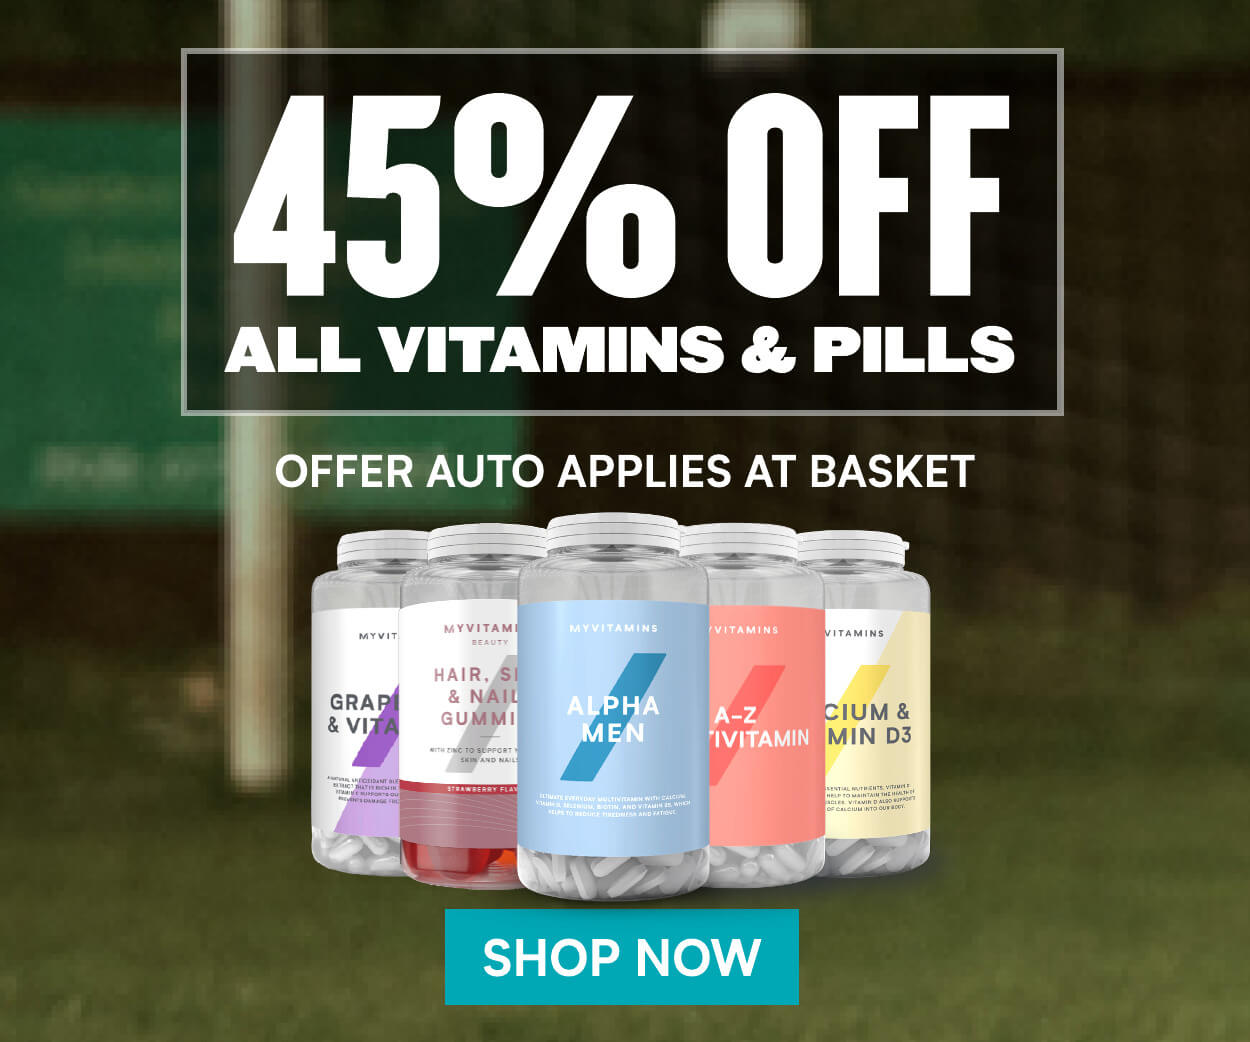 45% off vitamins